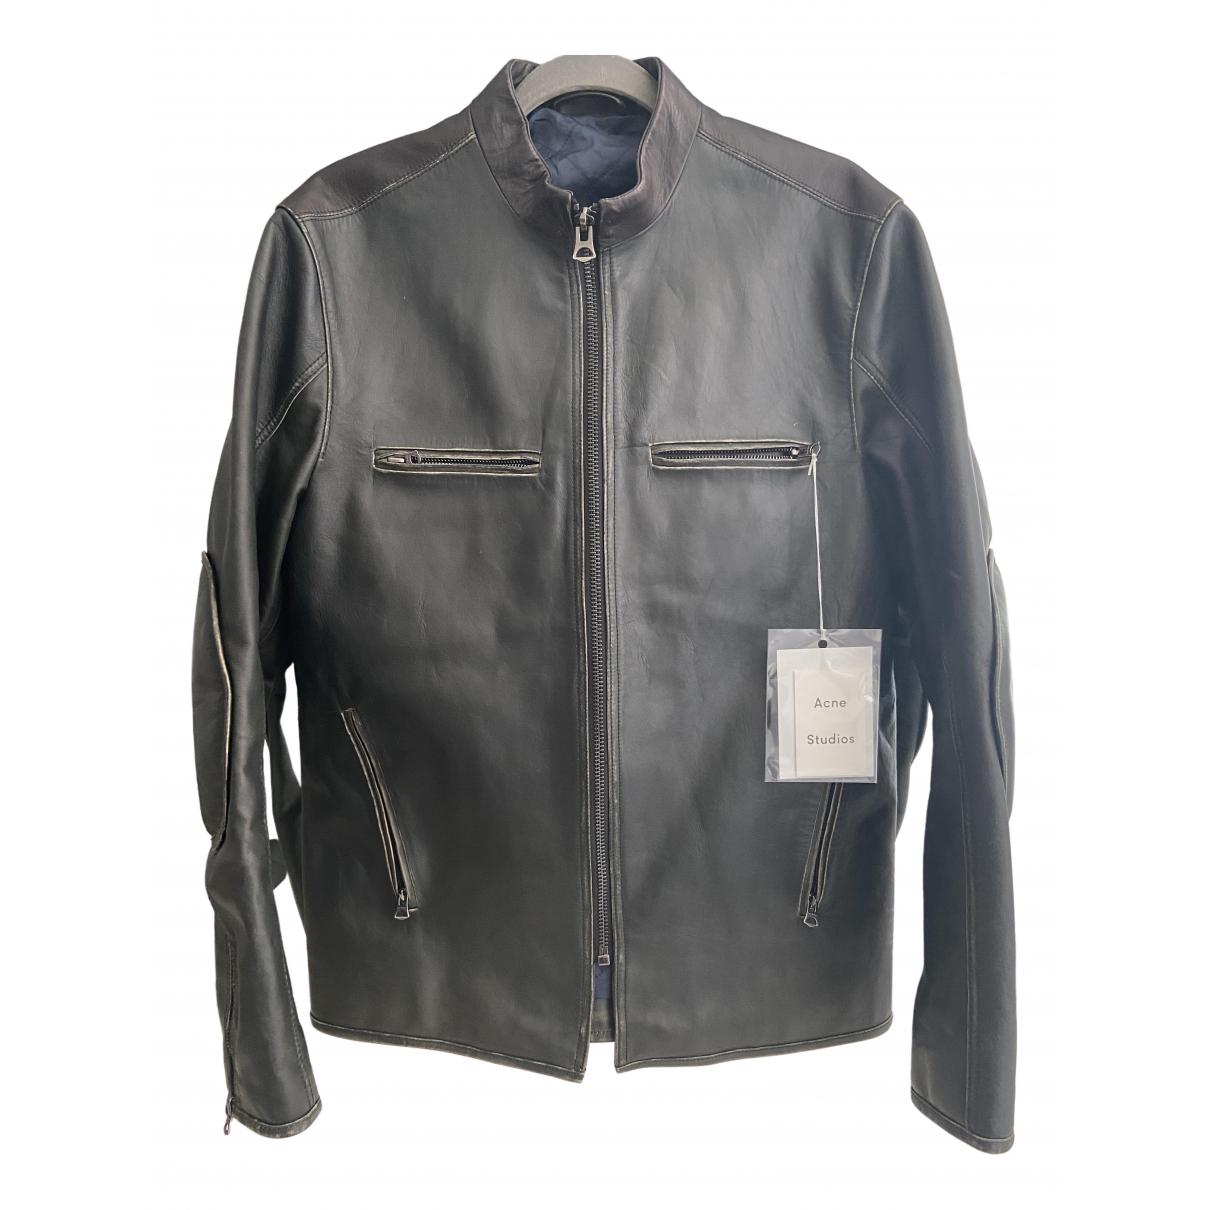 Acne Studios \N Green Leather jacket  for Men M International